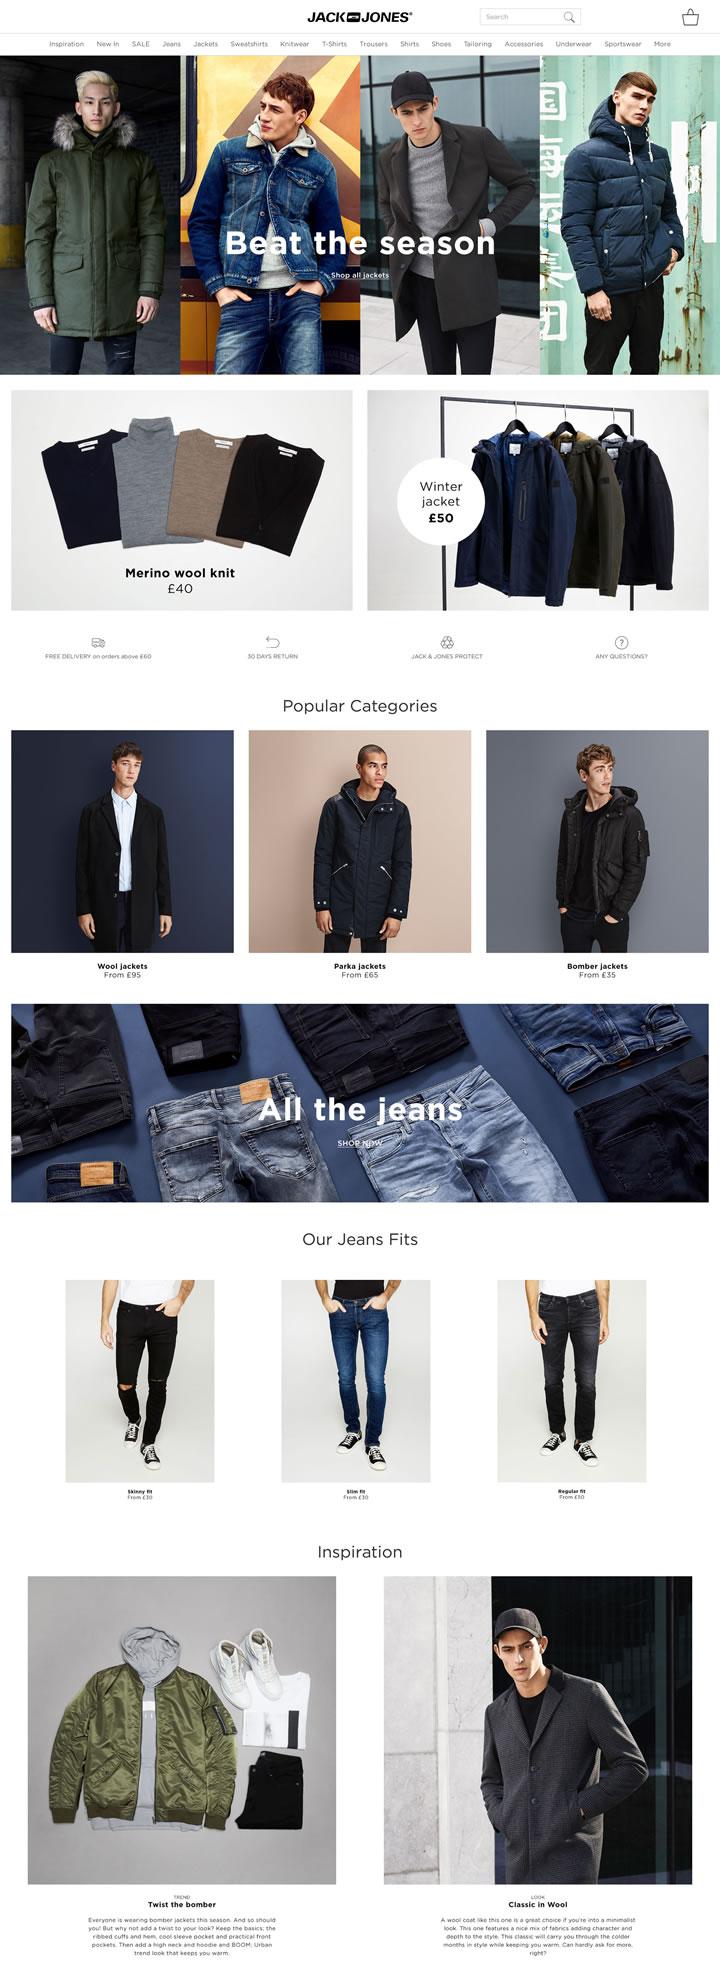 JACK & JONES英国官方网站:欧洲领先的男装生产商